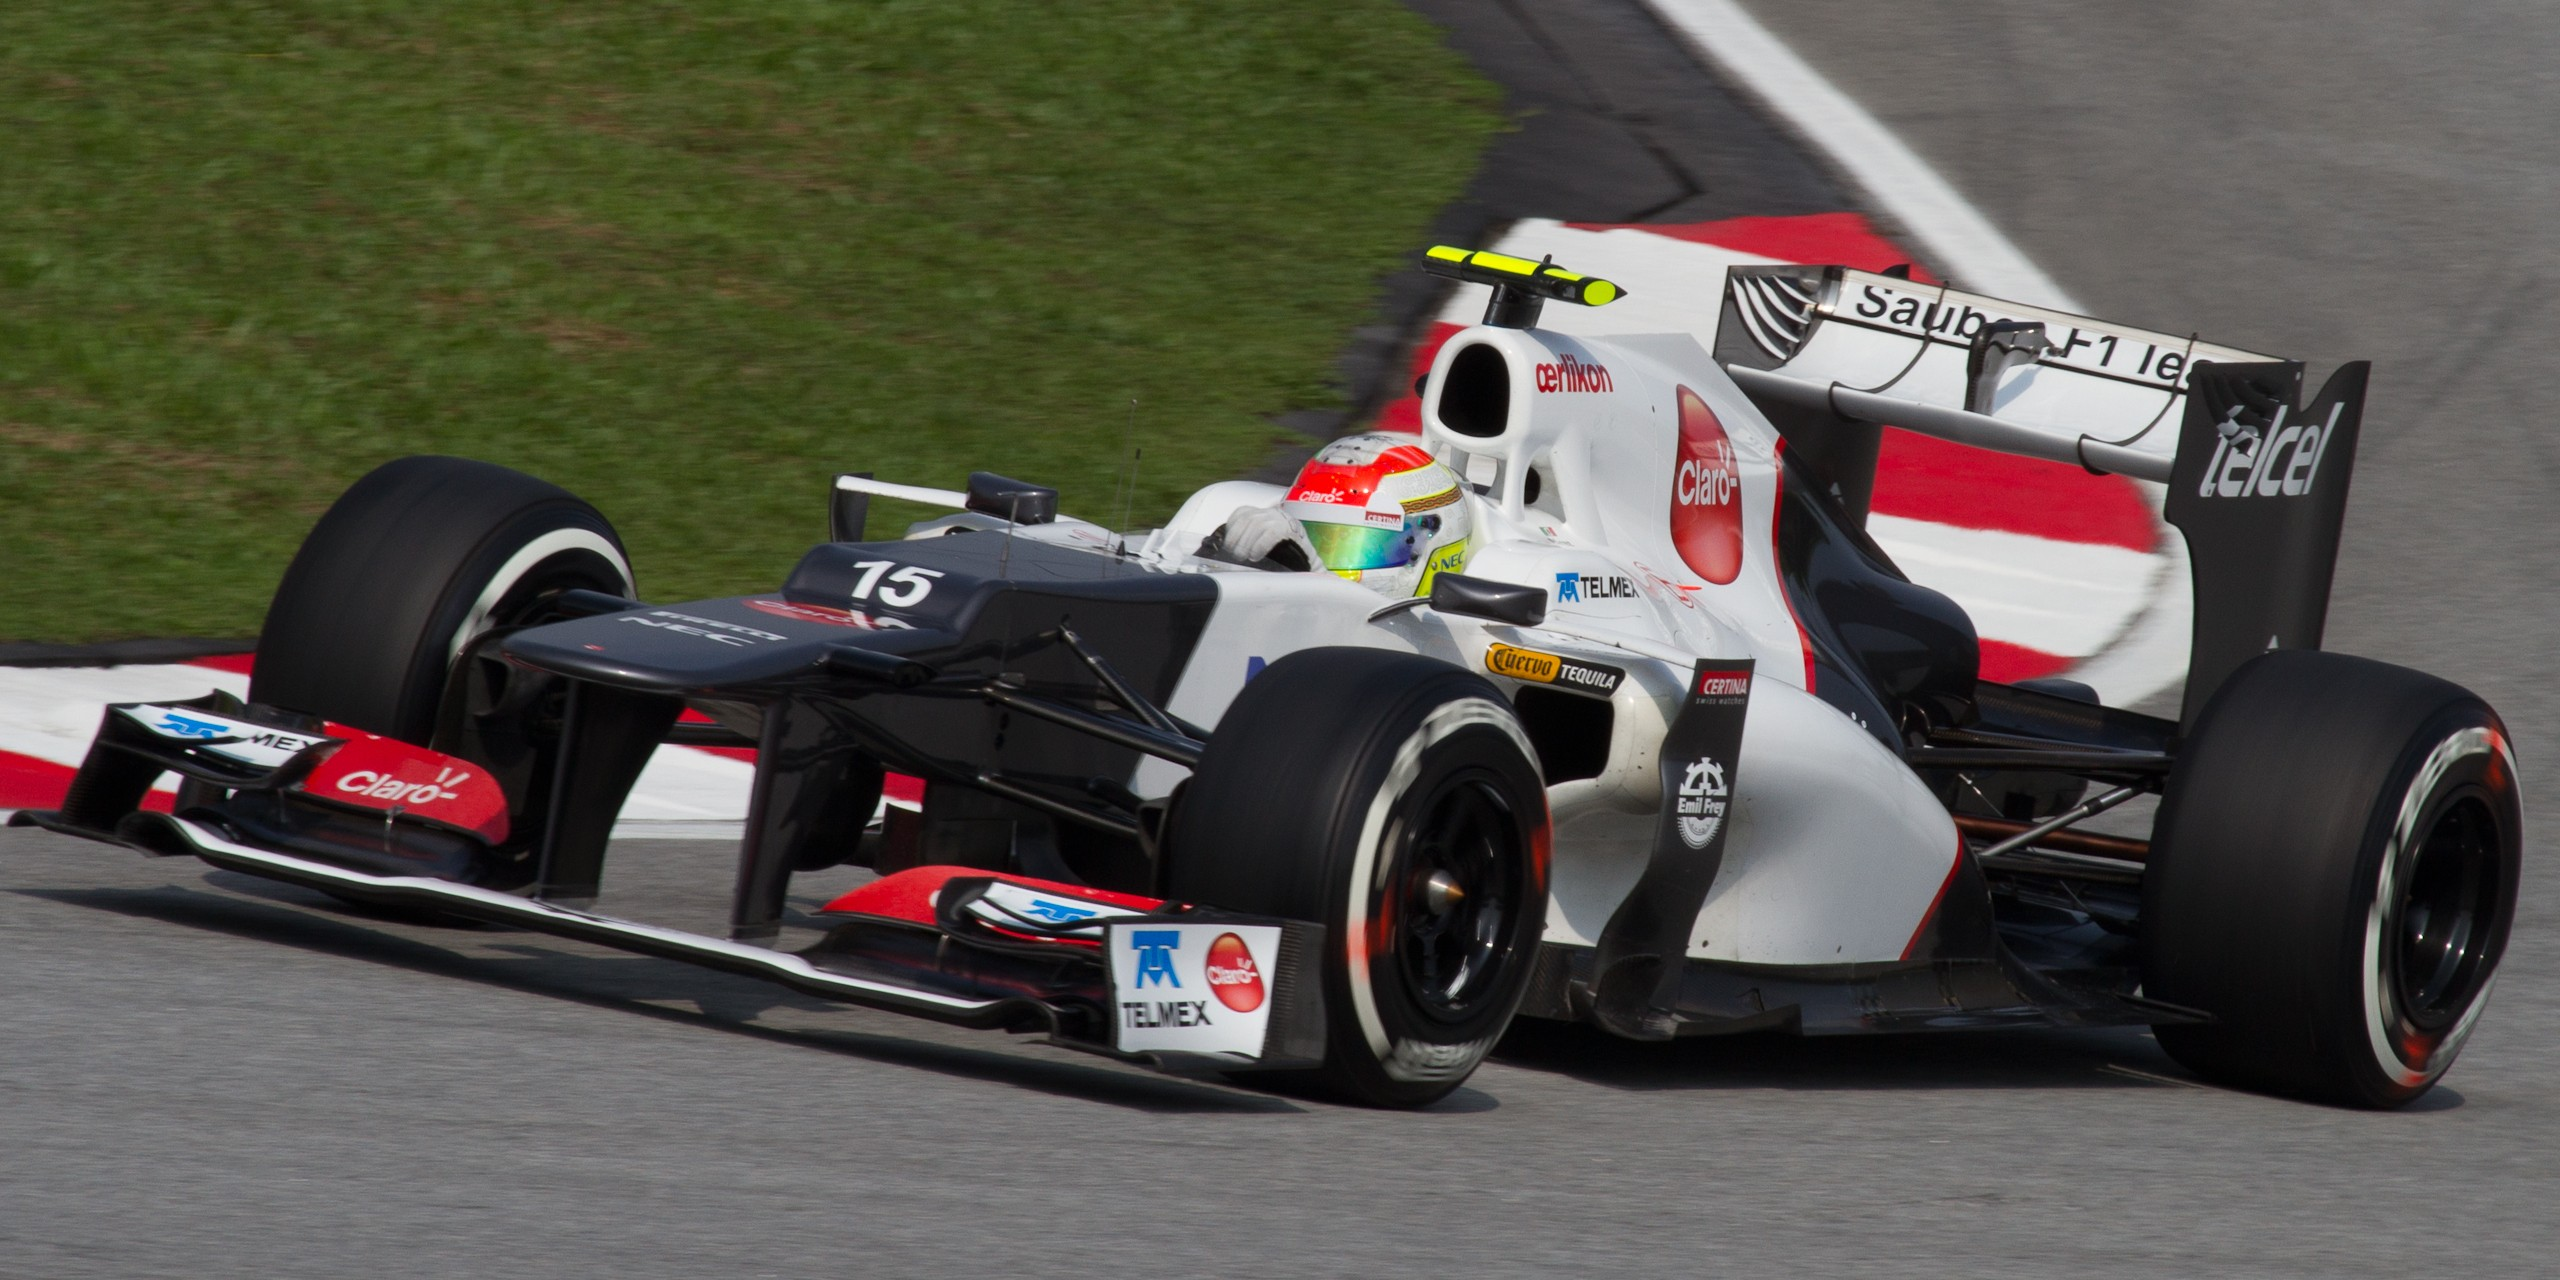 File:Sergio Perez 2012 Malaysia Qualify.jpg - Wikimedia Commons